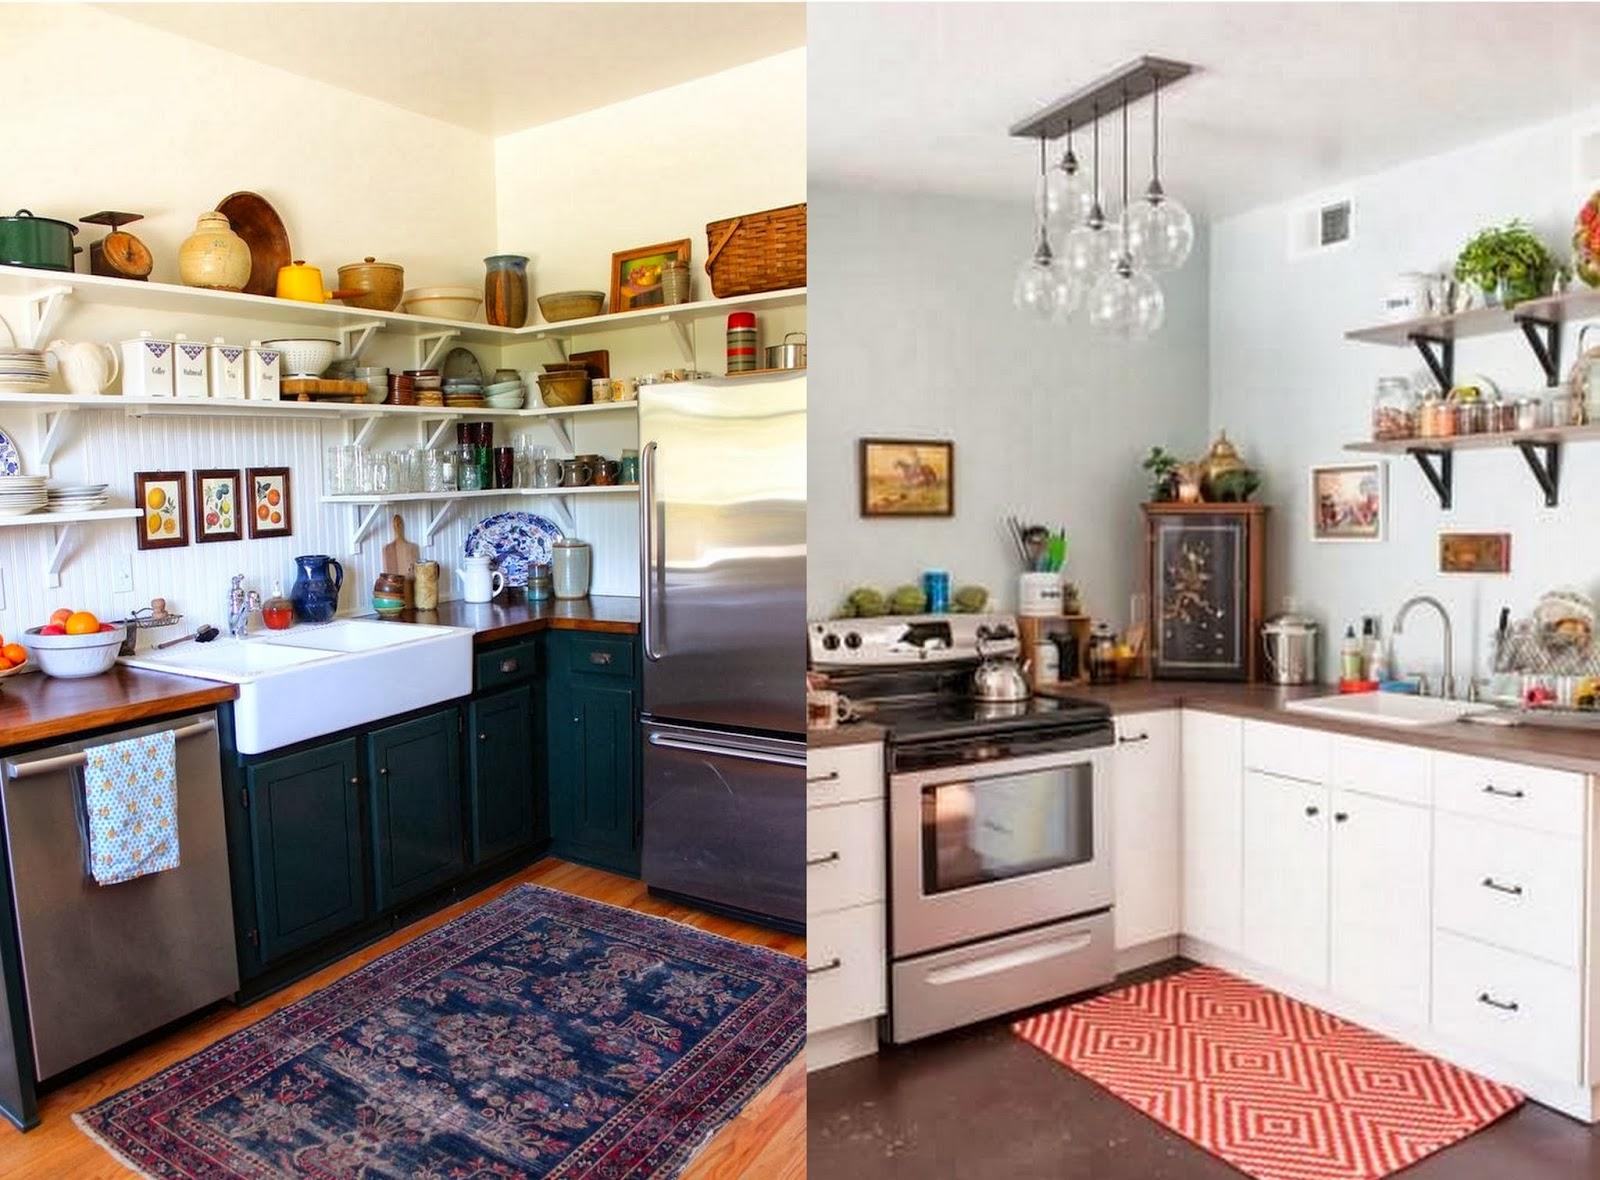 kitchen shelf display ideas sink at lowes gypsy yaya: september 2013